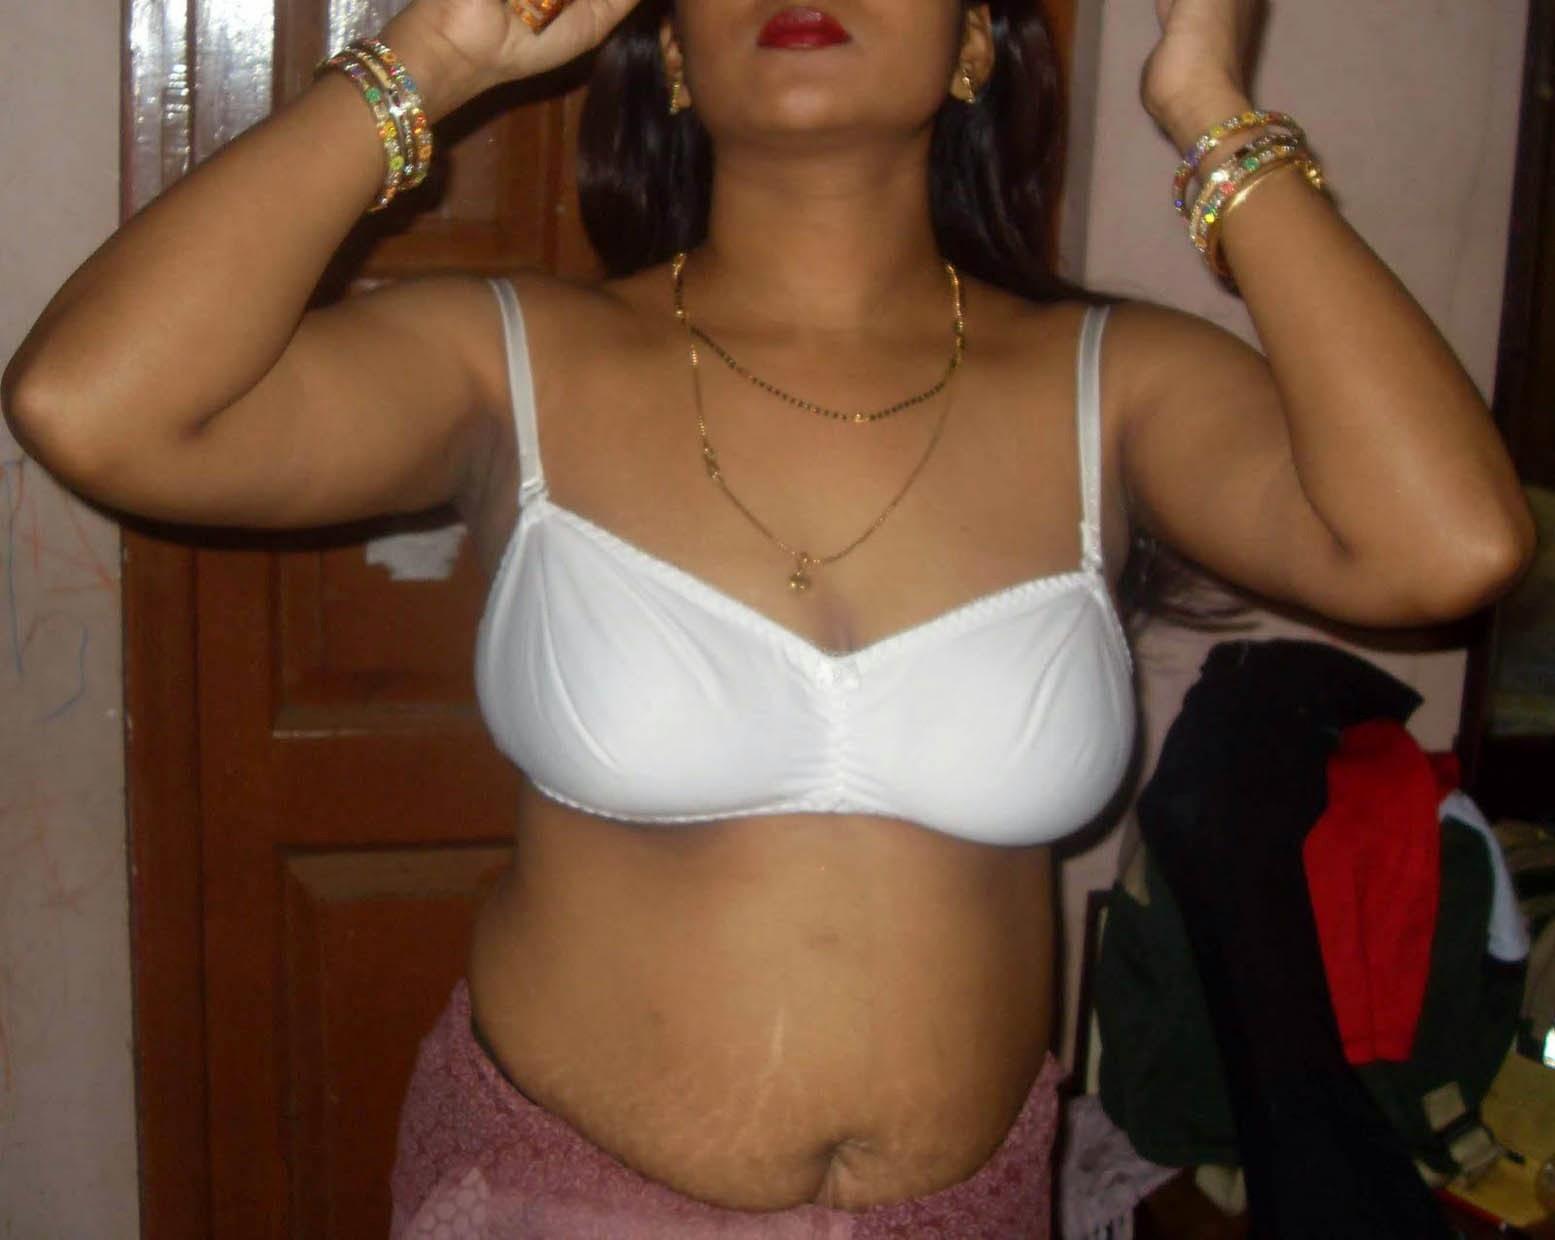 Hedieh Tehrani nude